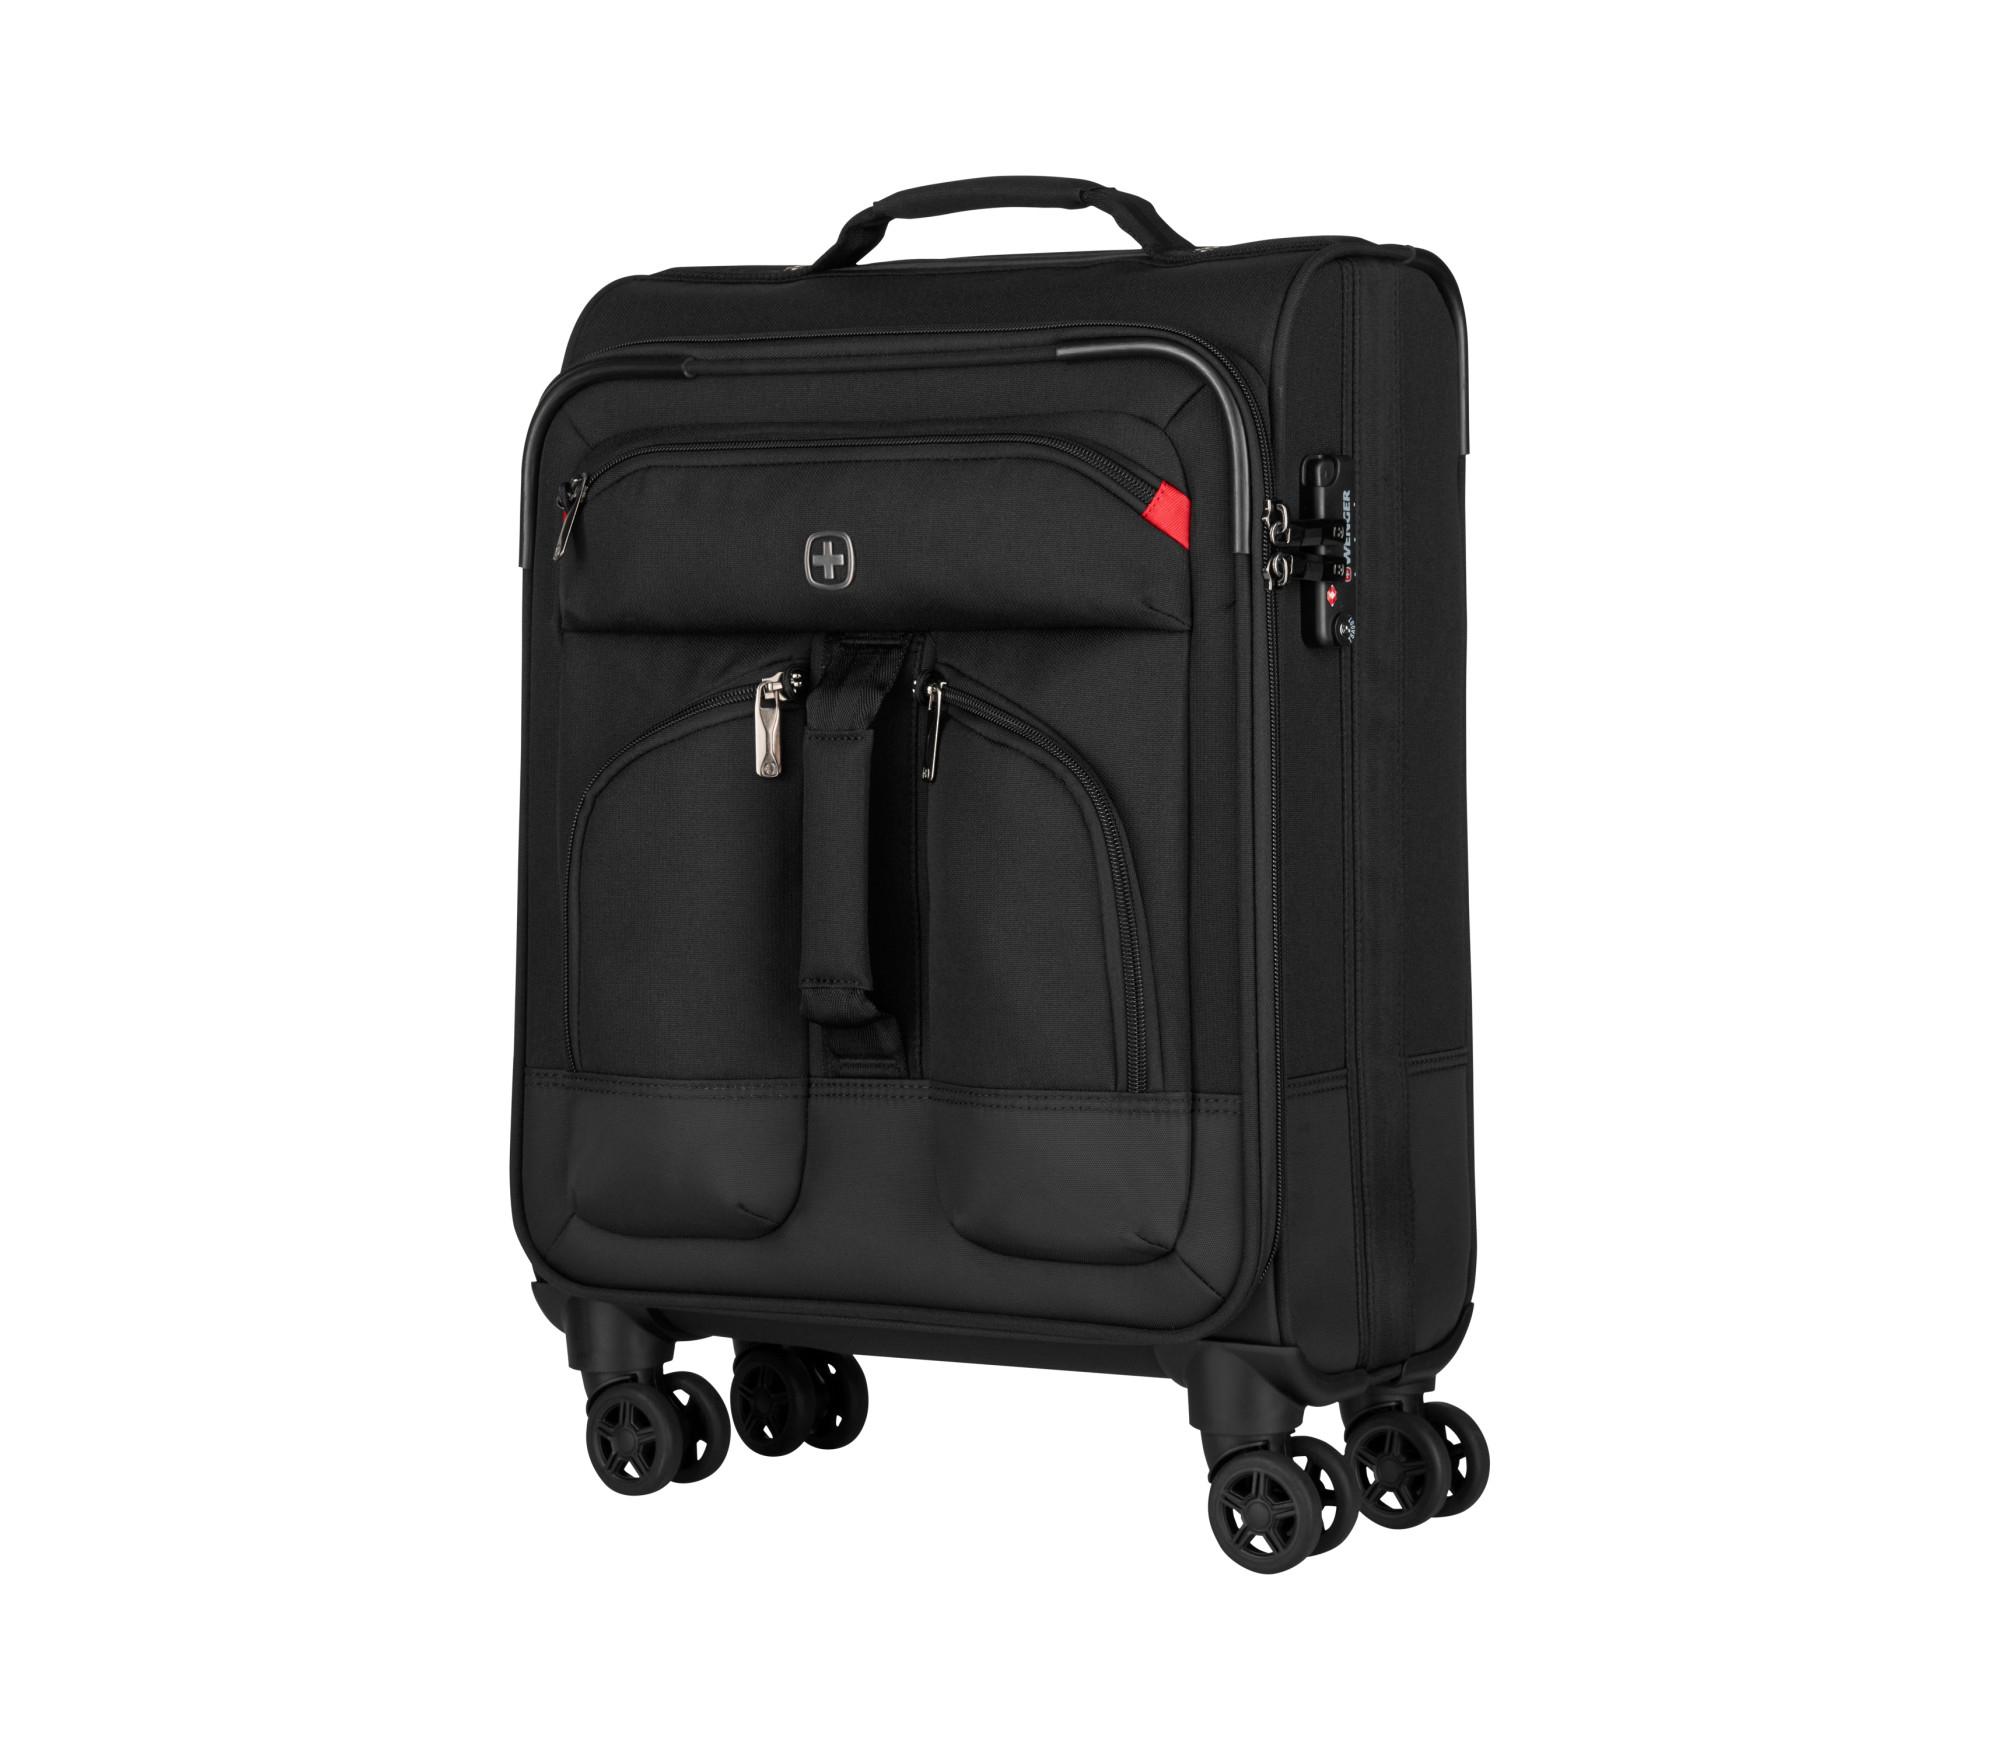 Wenger/SwissGear 604369 luggage bag Trolley Black Polyester 34 L